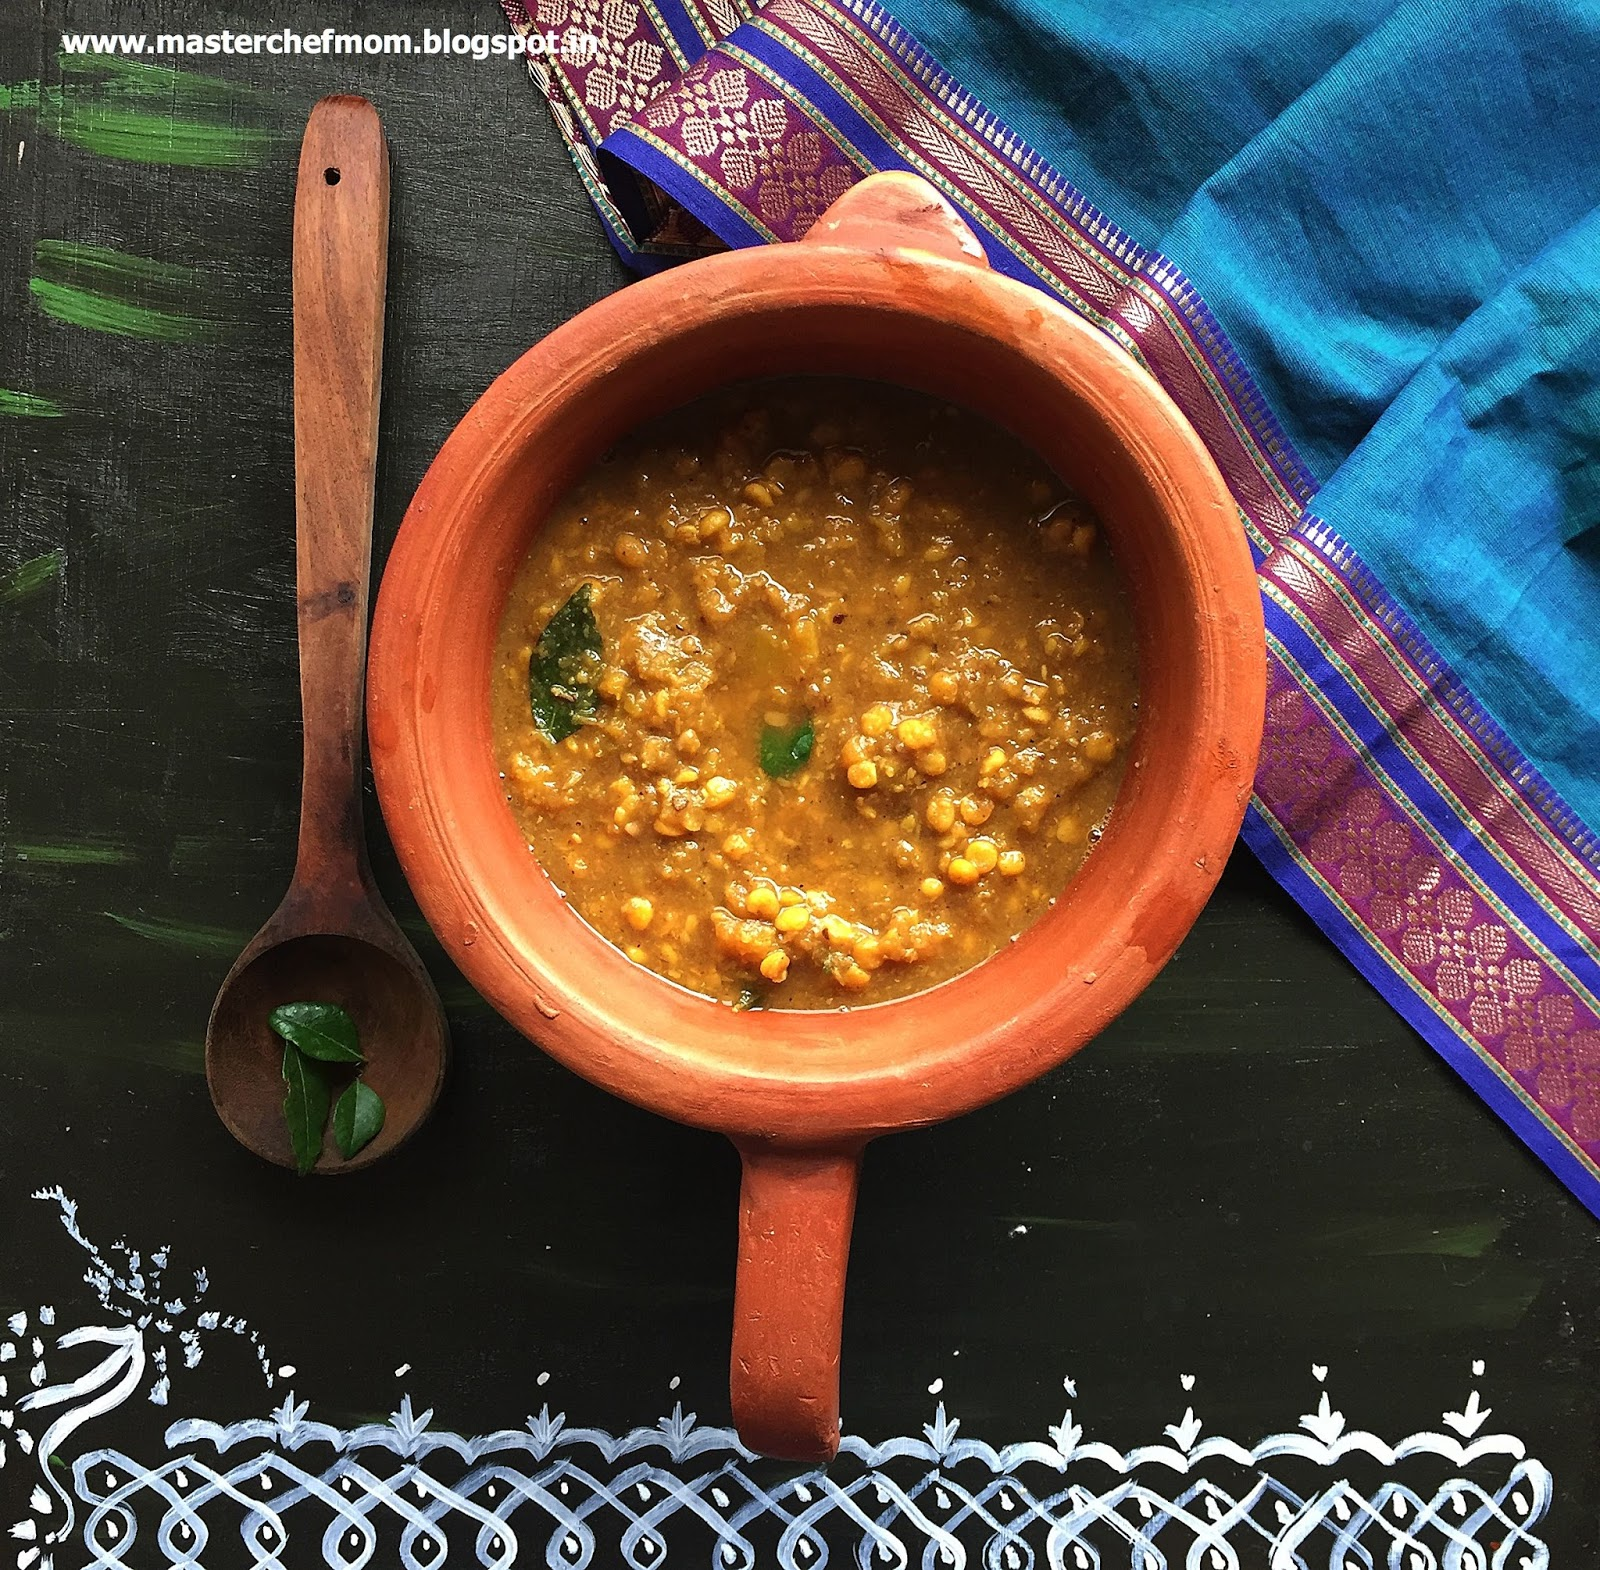 Masterchefmom arumai nayagam sambar traditional sambar recipe arumai nayagam sambar traditional sambar recipe from tamil nadu gluten free and vegan recipe forumfinder Images